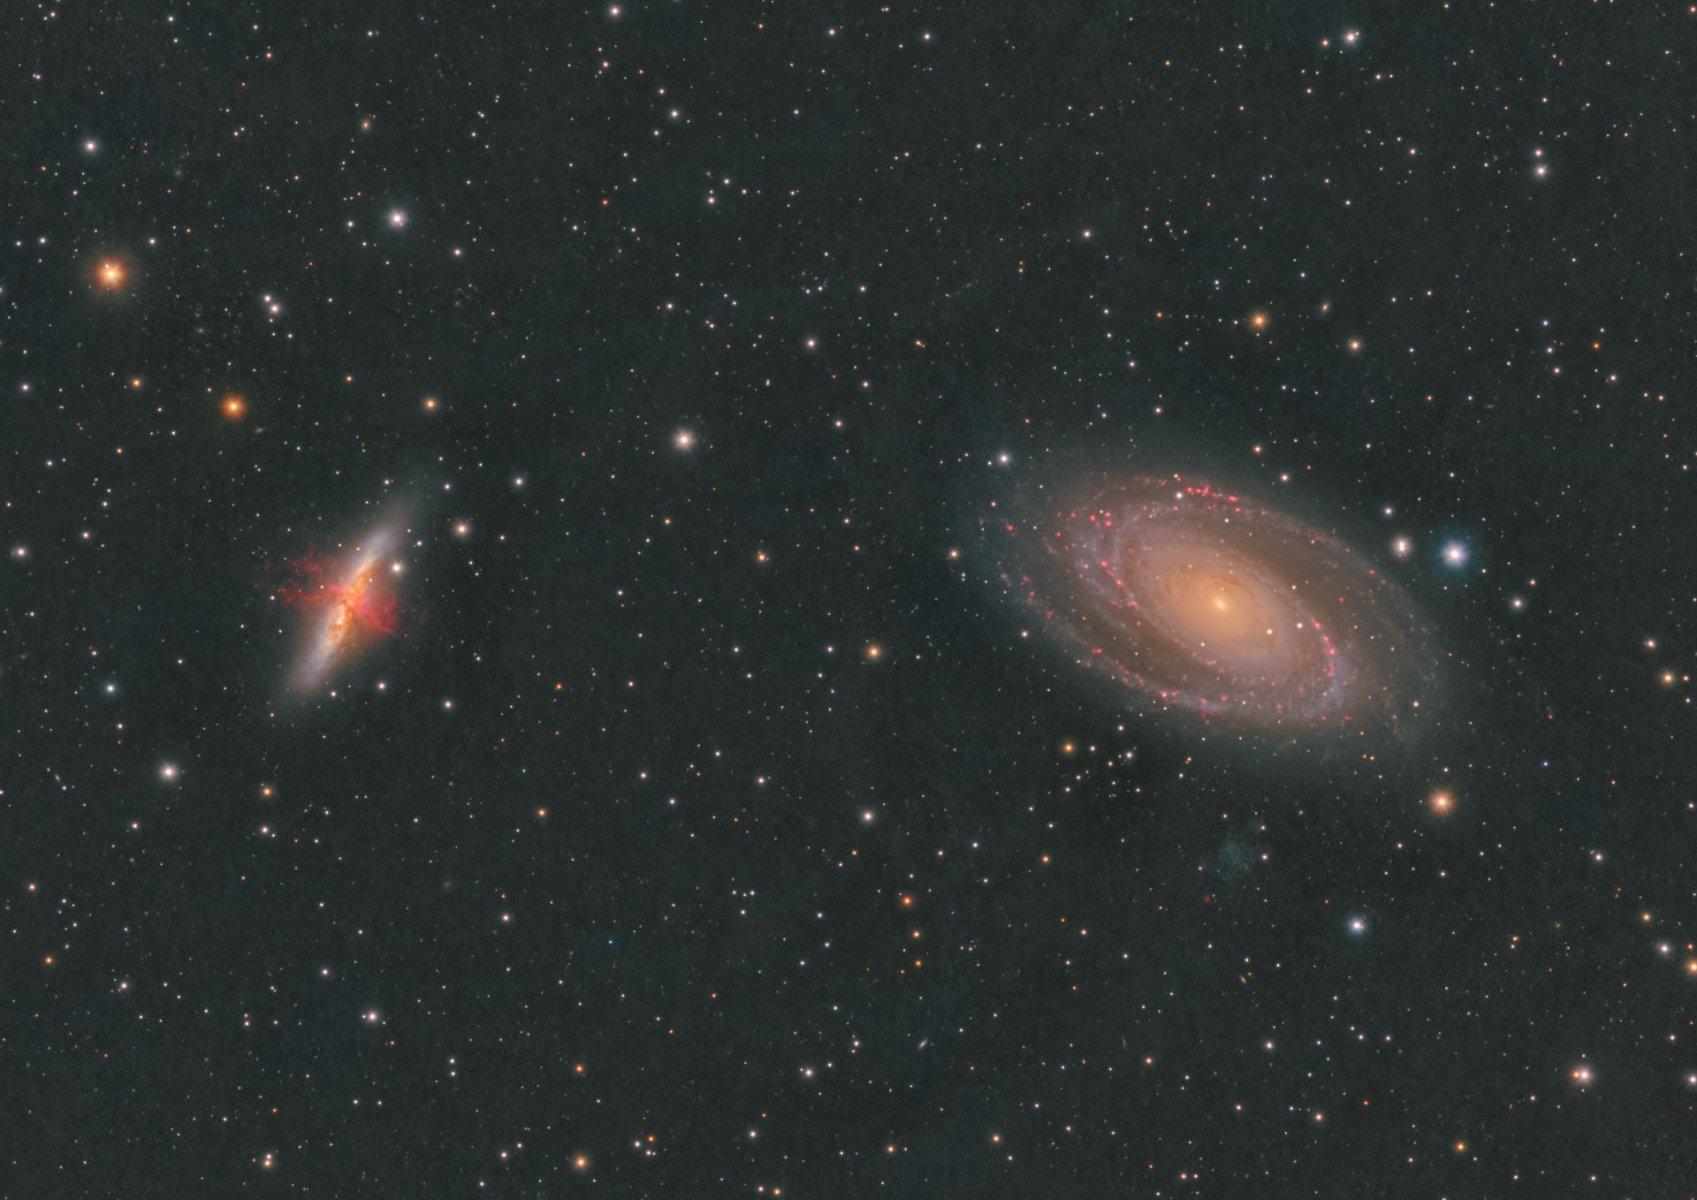 M81_M82_LRGBHa_all_crop_web.jpg